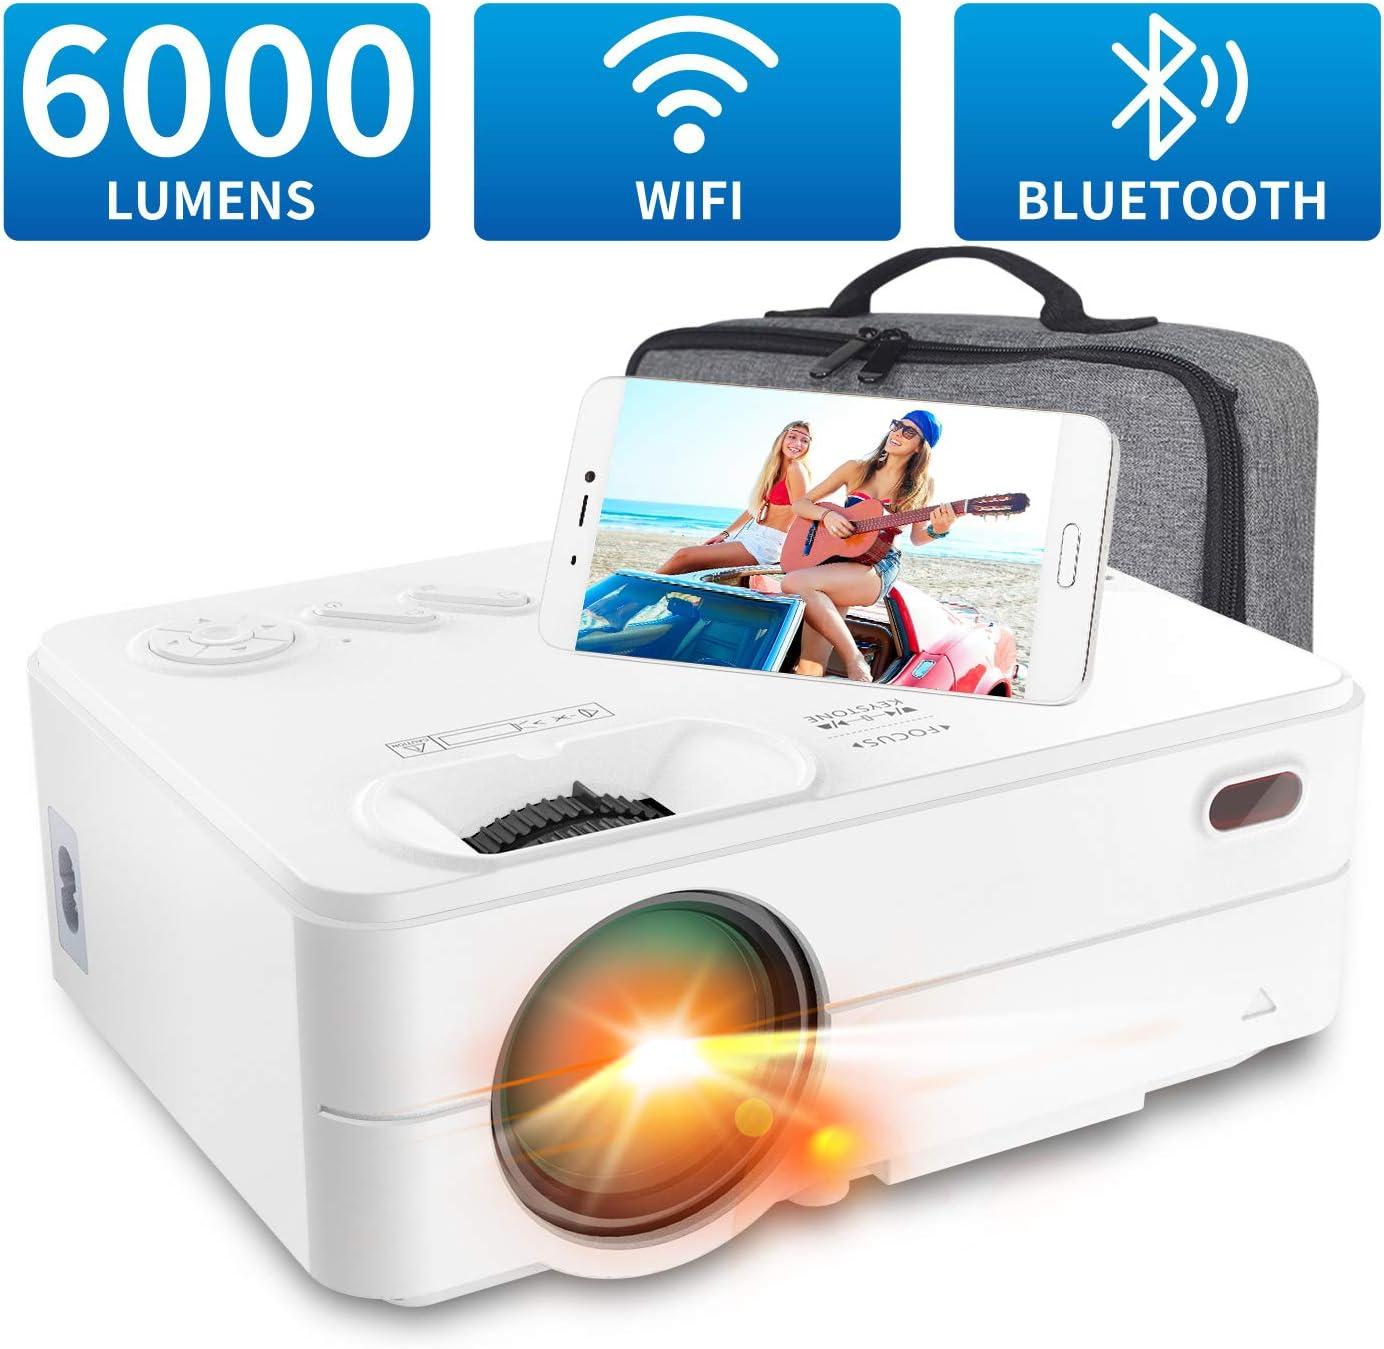 Mini Proyector WiFi Bluetooth 6000 Lúmenes, Artlii Enjoy2 Mini Proyector Portátil Móvil 720P Nativo, 300